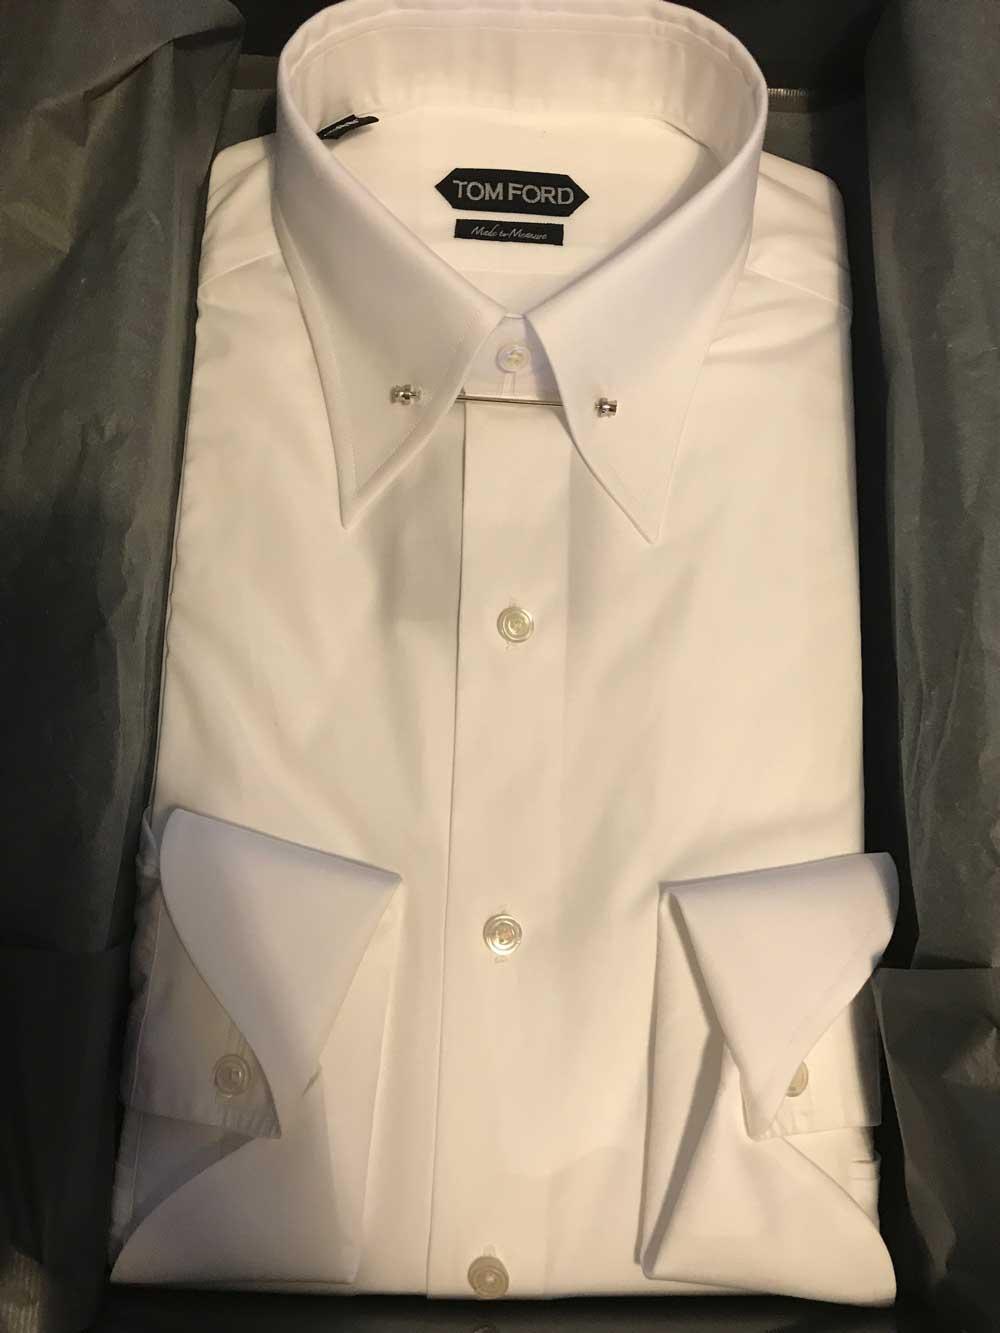 TOM FORD Made to Measure Shirt